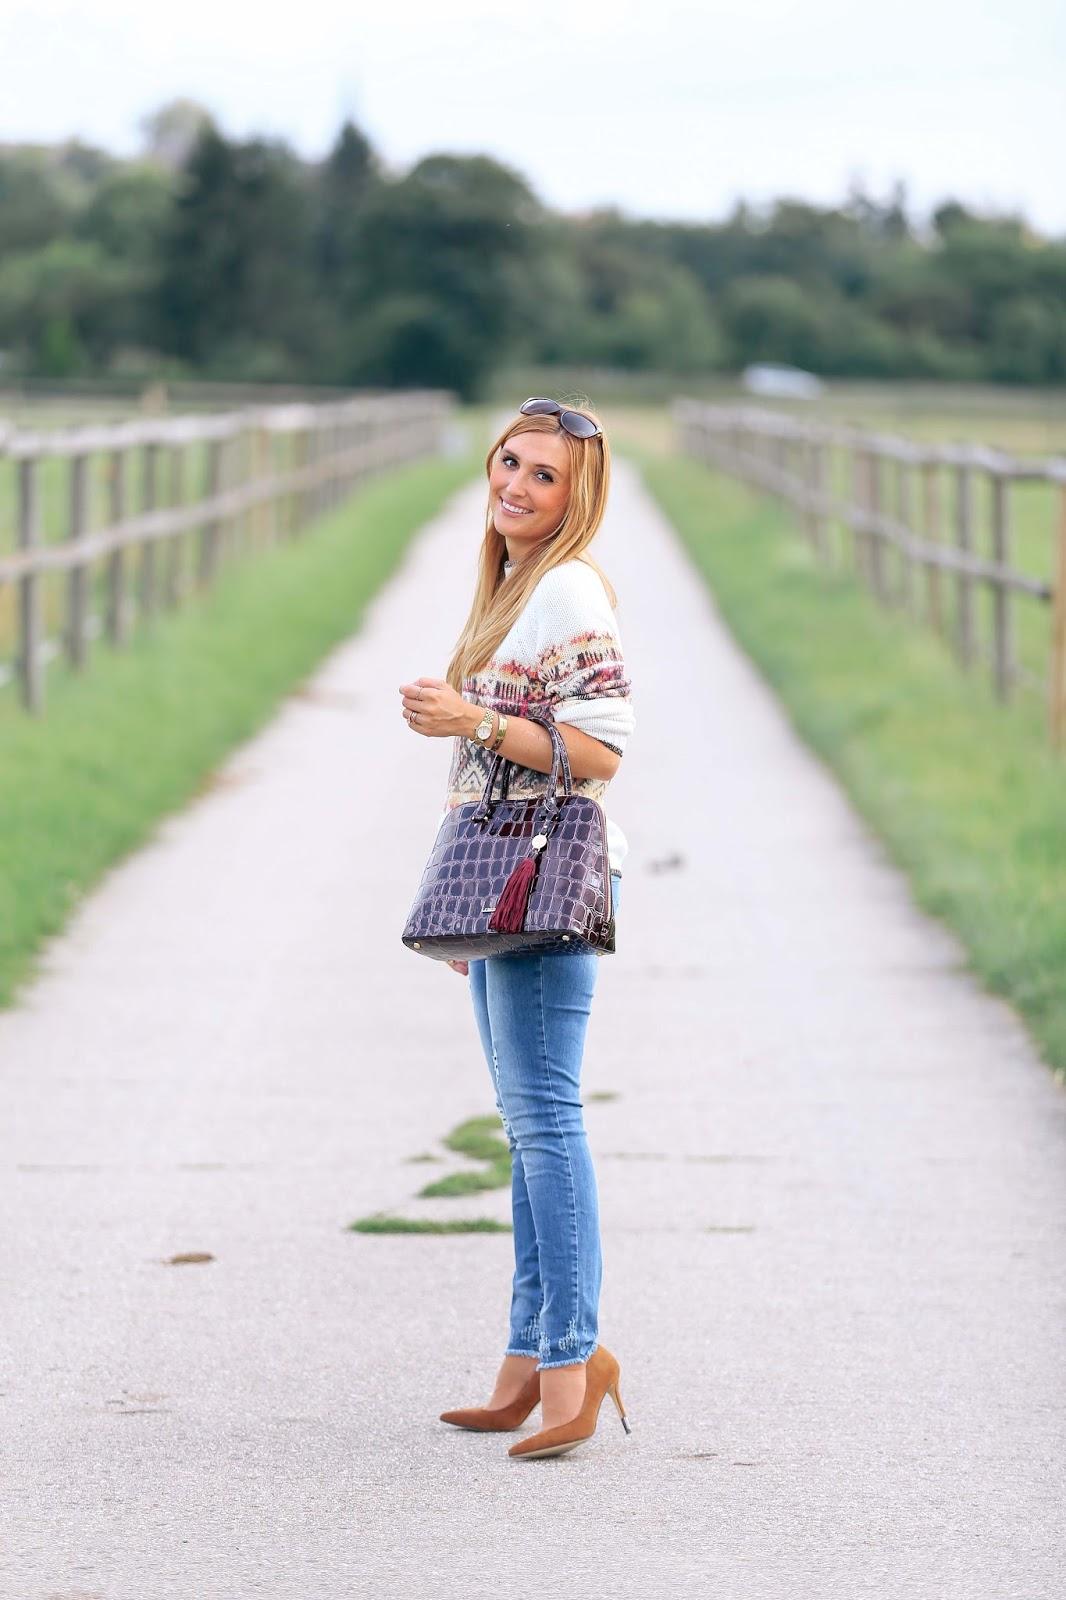 Marc-aurel-fashion-blogger-german-blogger-blonde-autumn-style-fall-cape-burberry-look-zara-booties-hm-hat